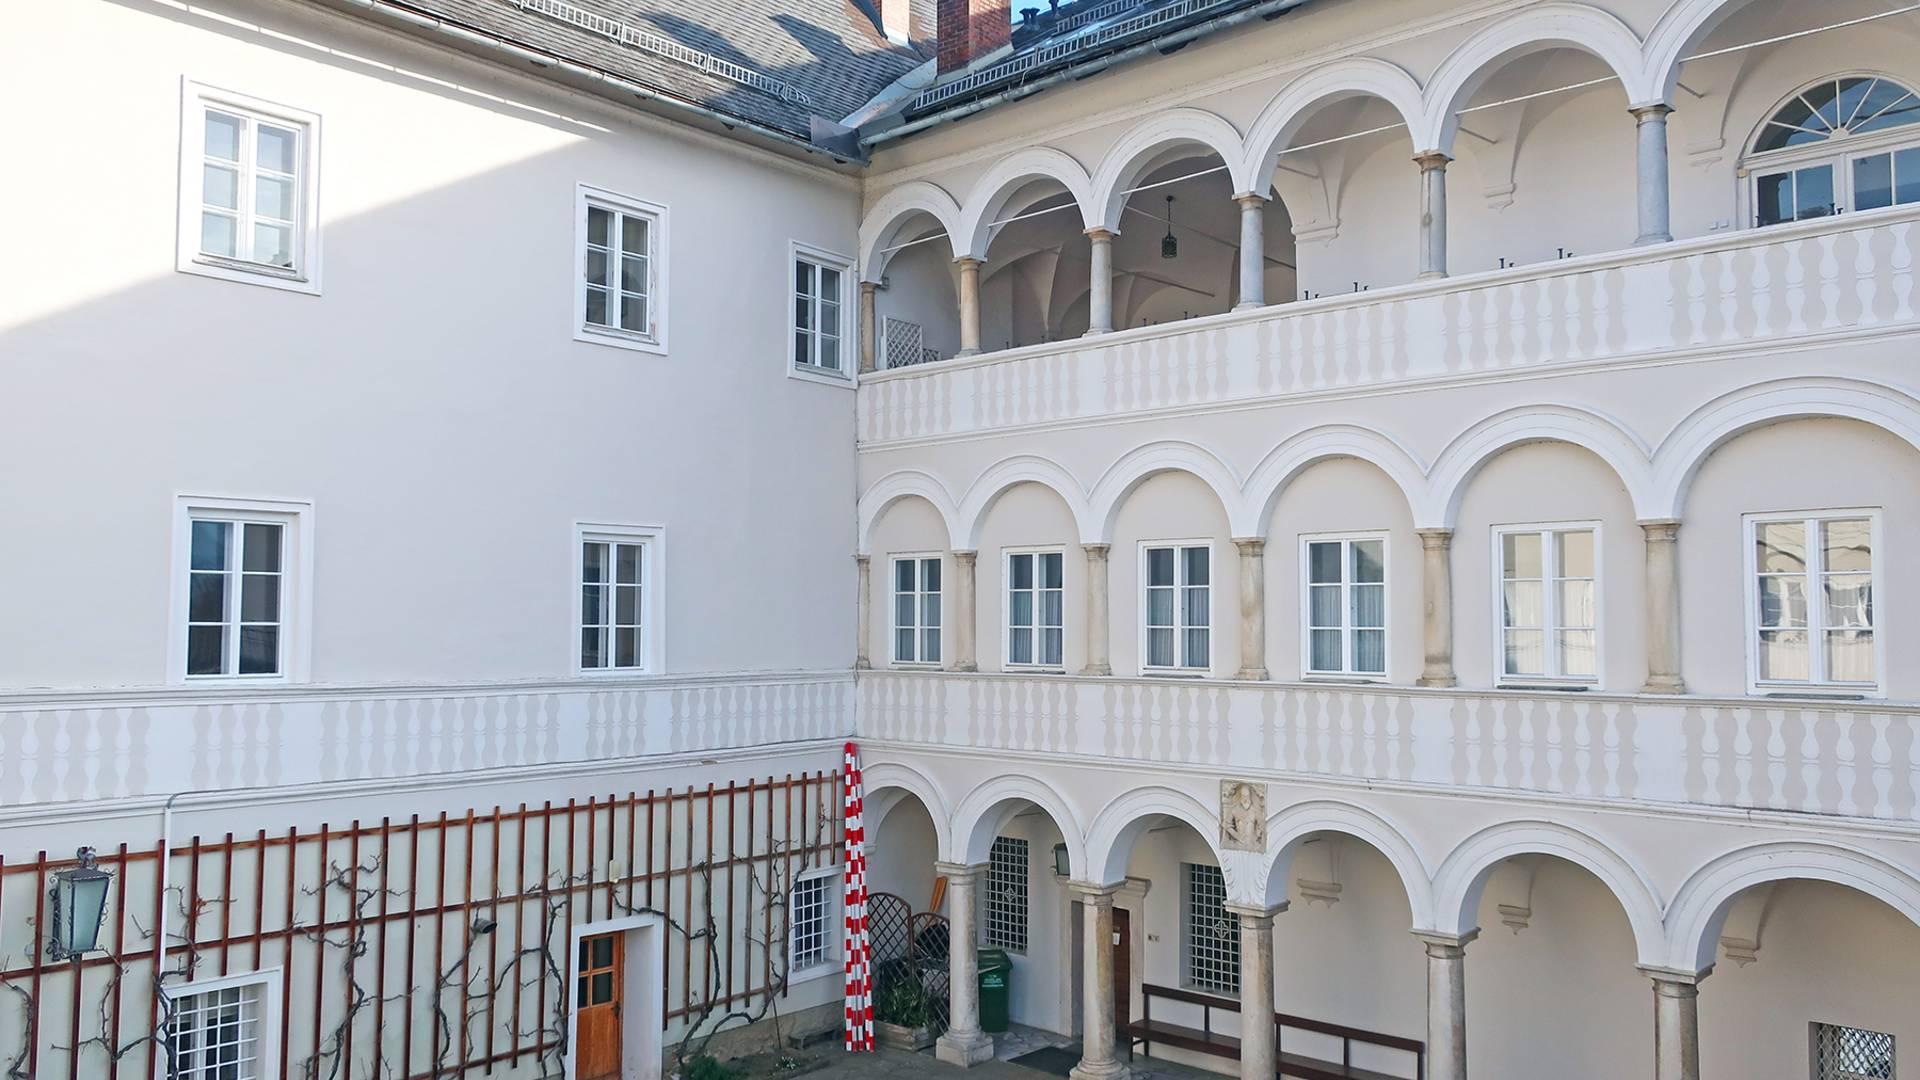 Kloster Wernberg c Kosmopoetin